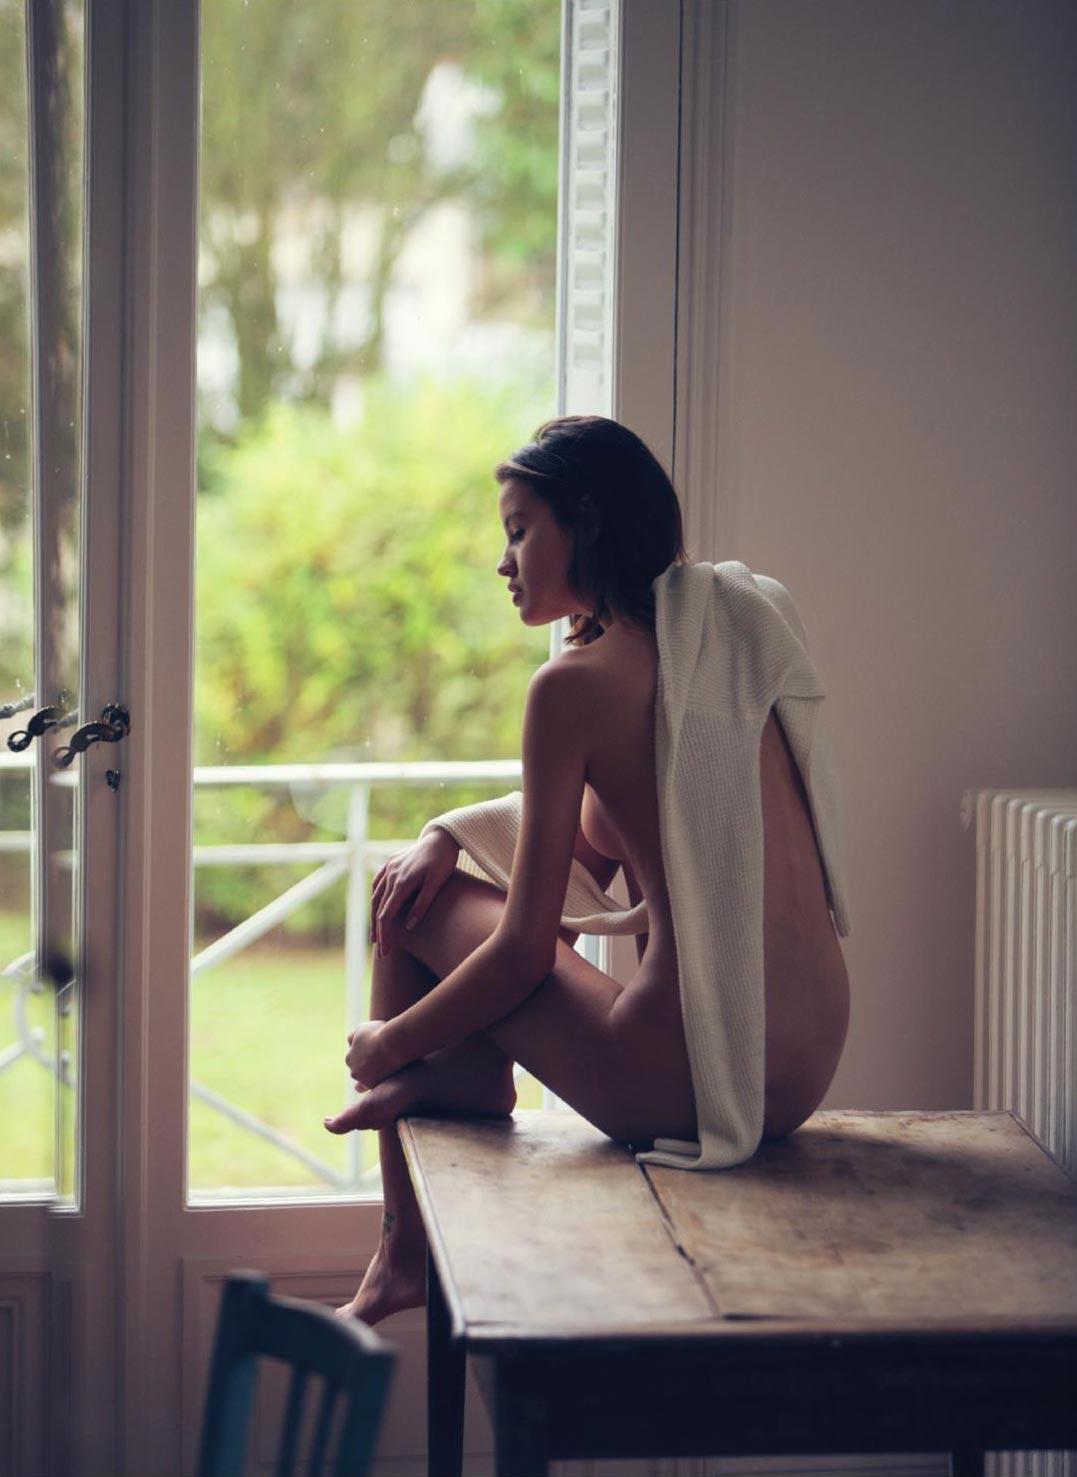 обнаженная Бьянка Михок / Bianca Mihoc nude by David Bellemere - Lui Magazine february 2017